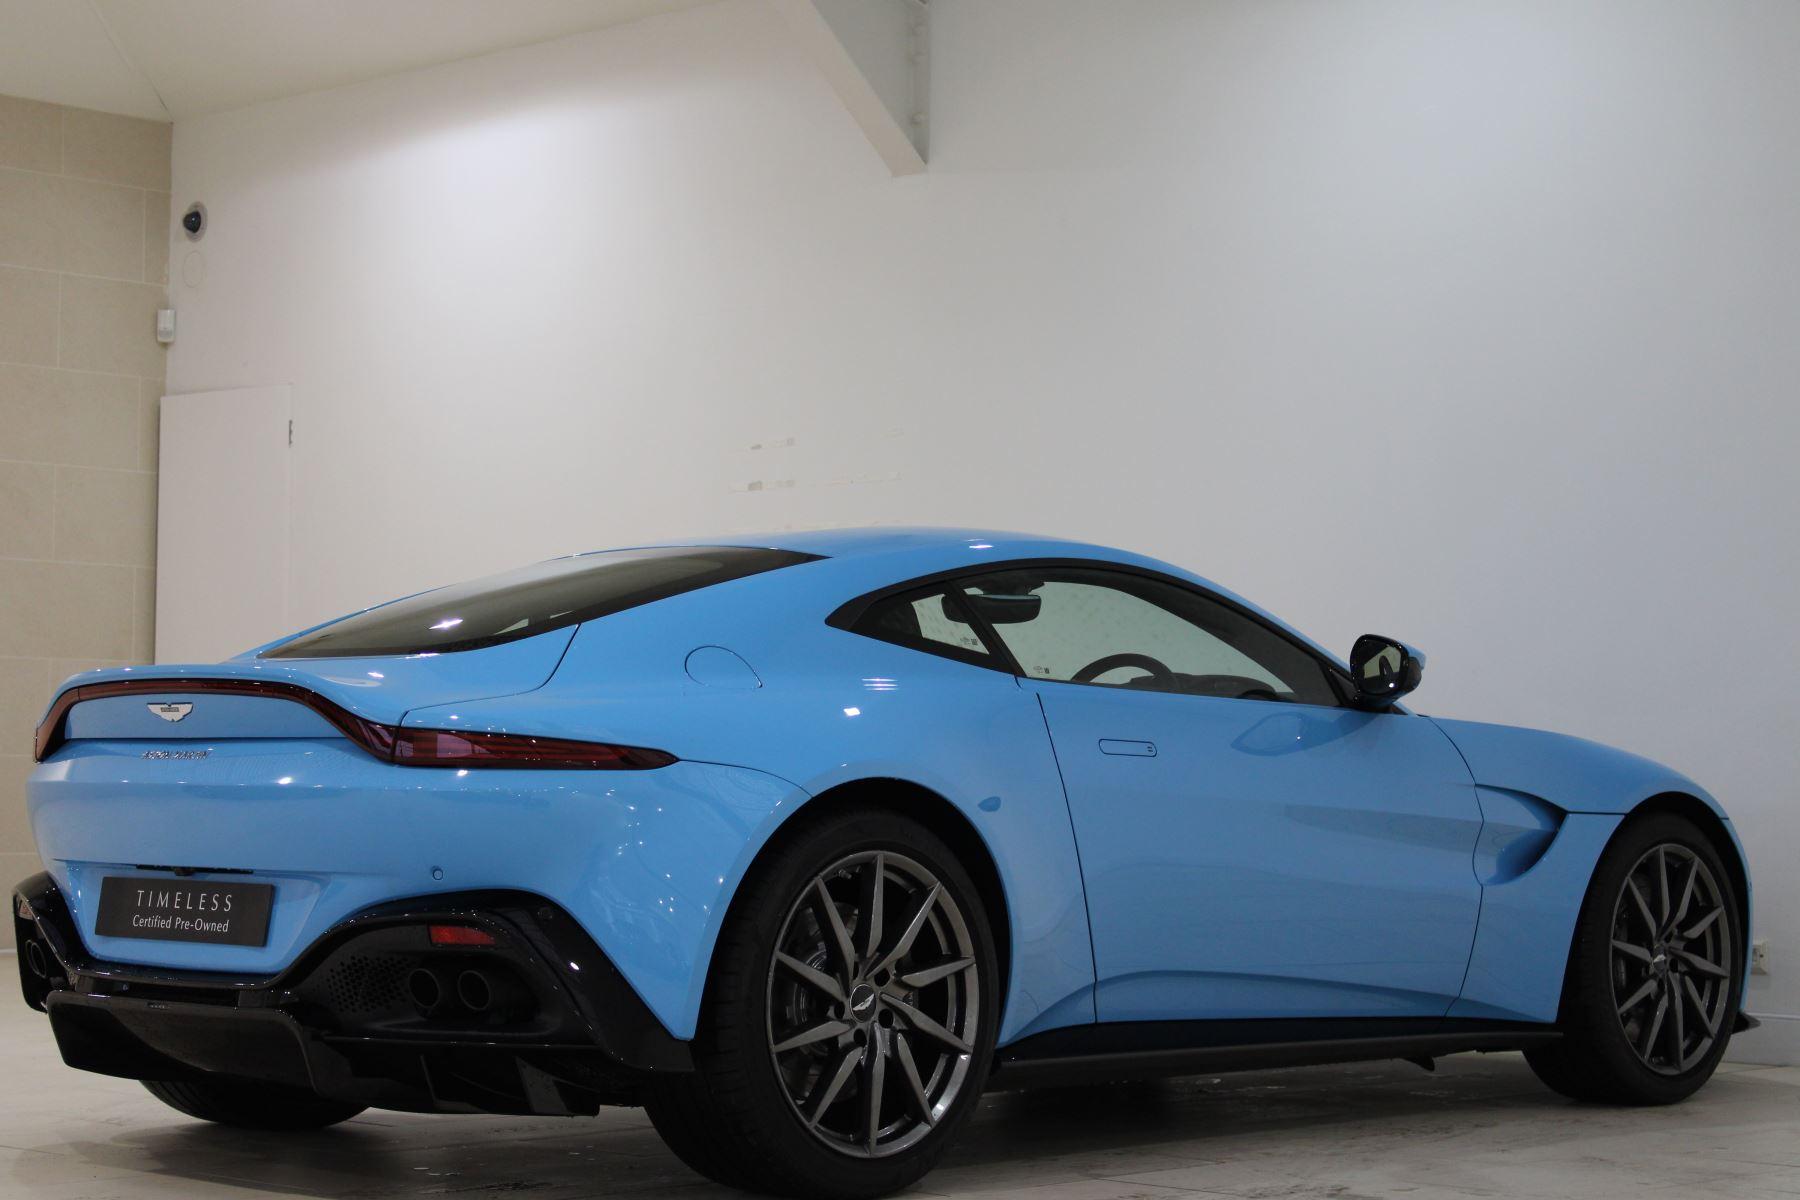 Aston Martin New Vantage 2dr image 7